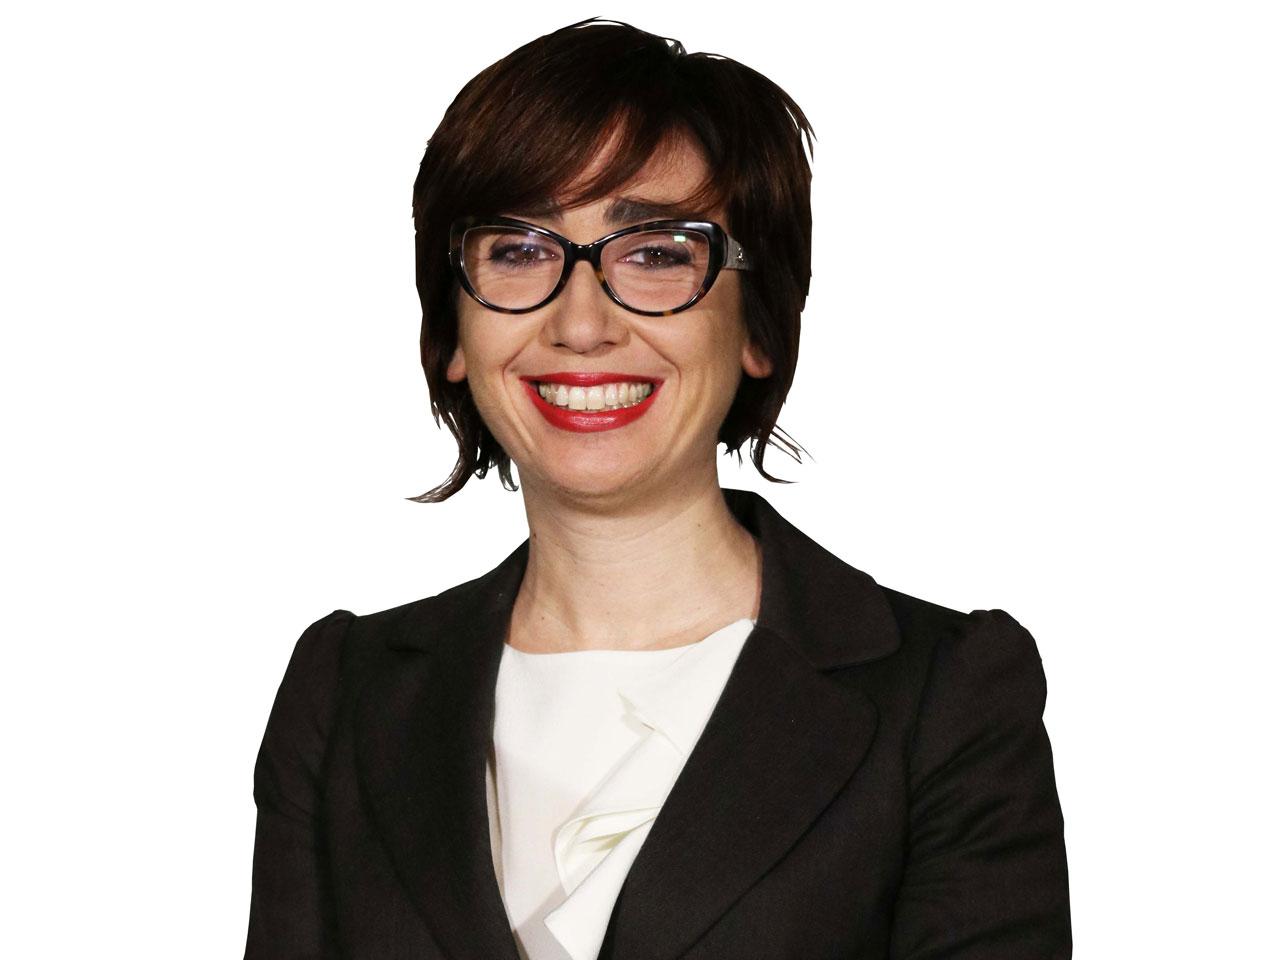 Vicesindaco Assessore Tania Fanigliuolo